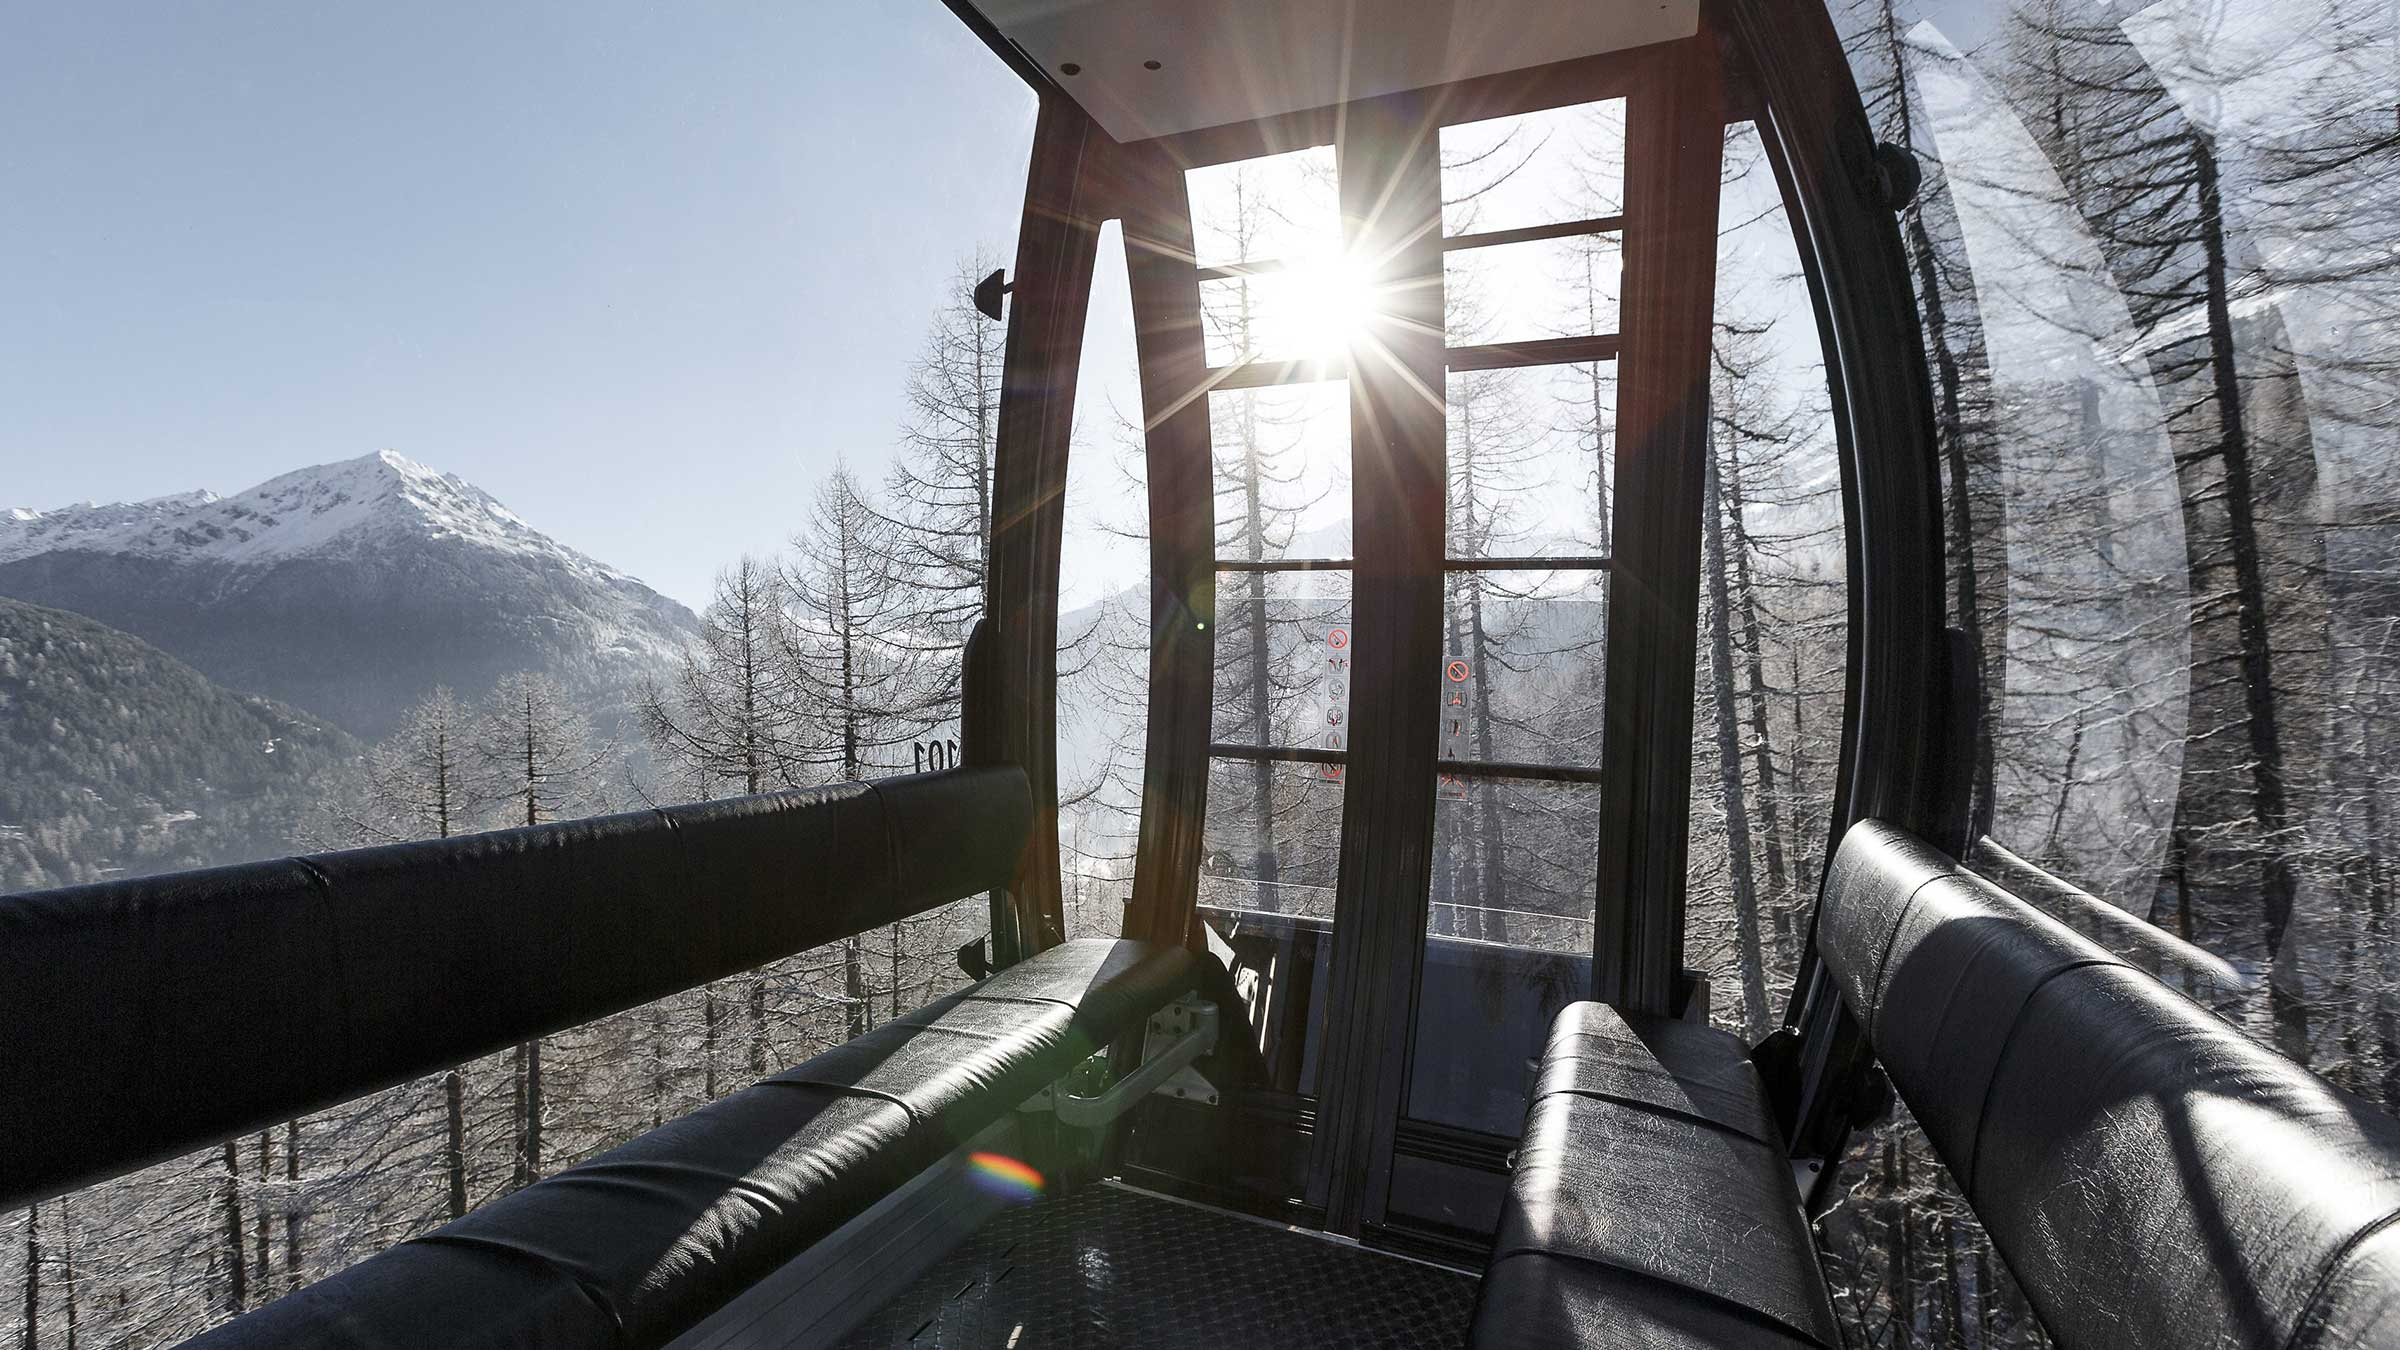 Kabine Giggijochbahn - EMF Pre-Silvester Party Sölden